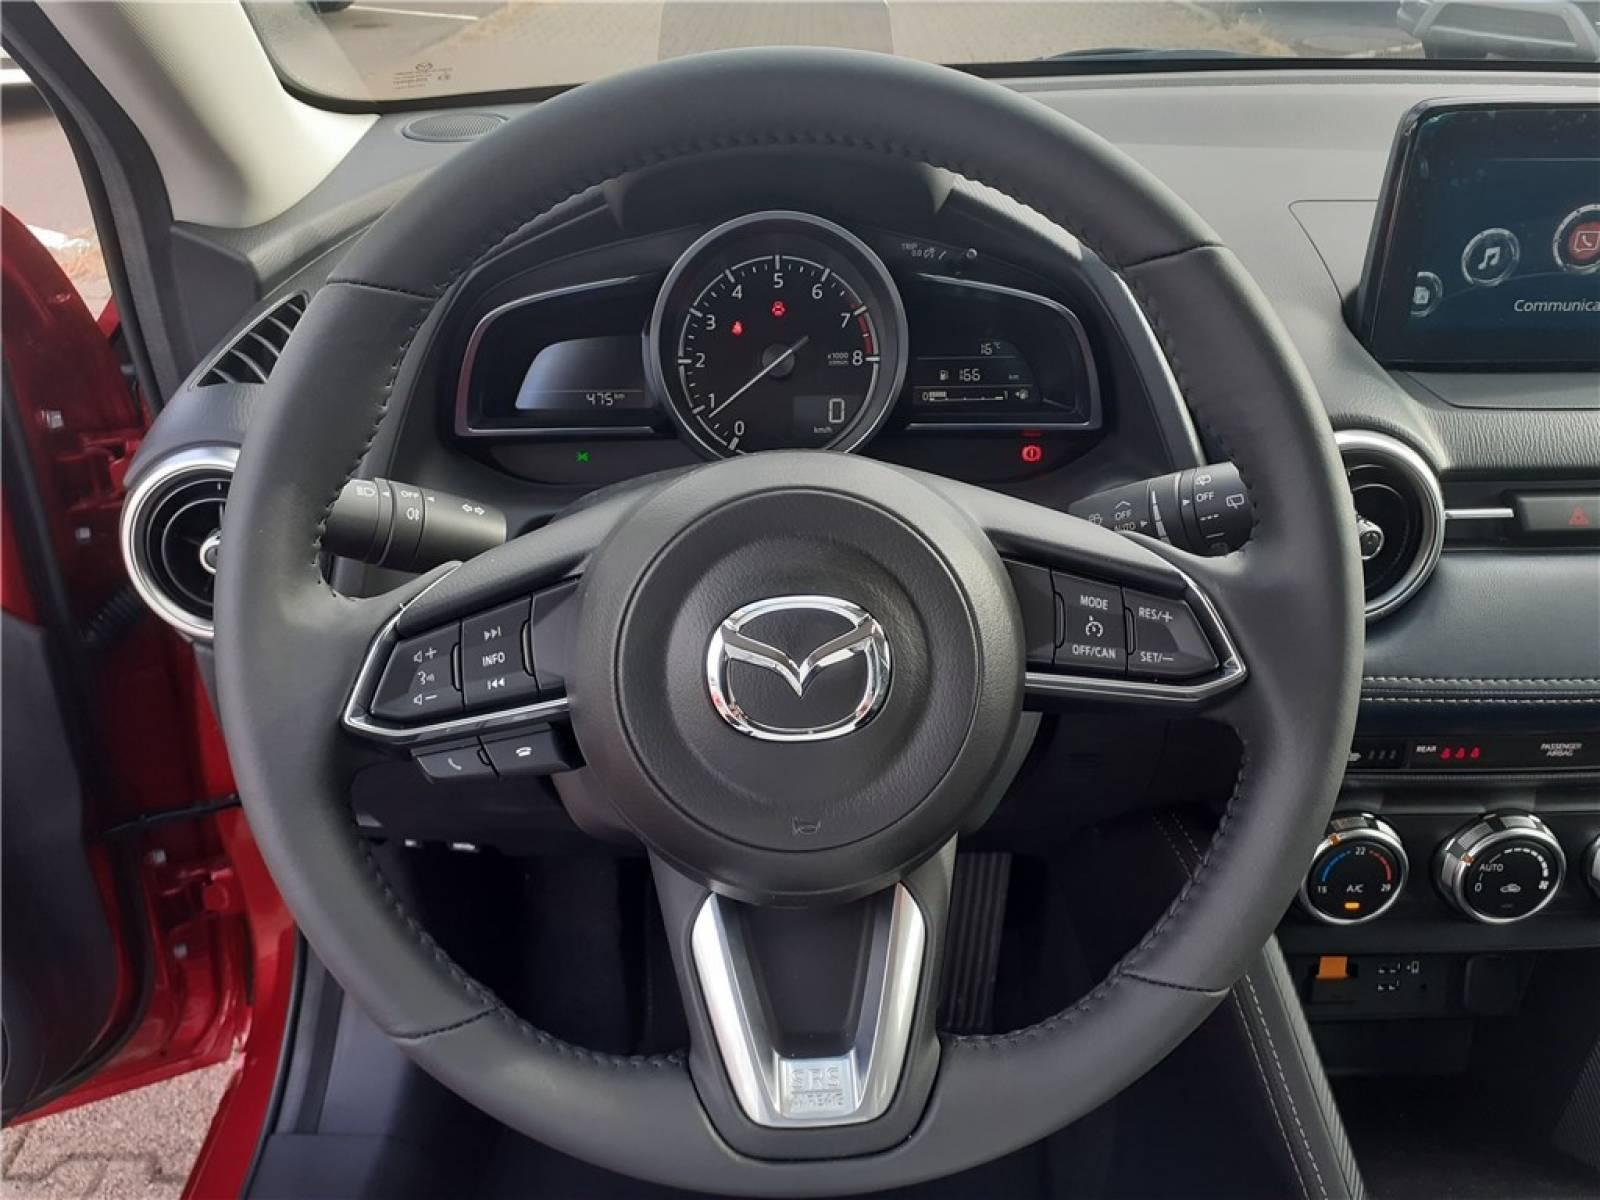 MAZDA Mazda2 1.5L SKYACTIV-G M Hybrid 90ch - véhicule d'occasion - Groupe Guillet - Chalon Automobiles - 71100 - Chalon-sur-Saône - 22